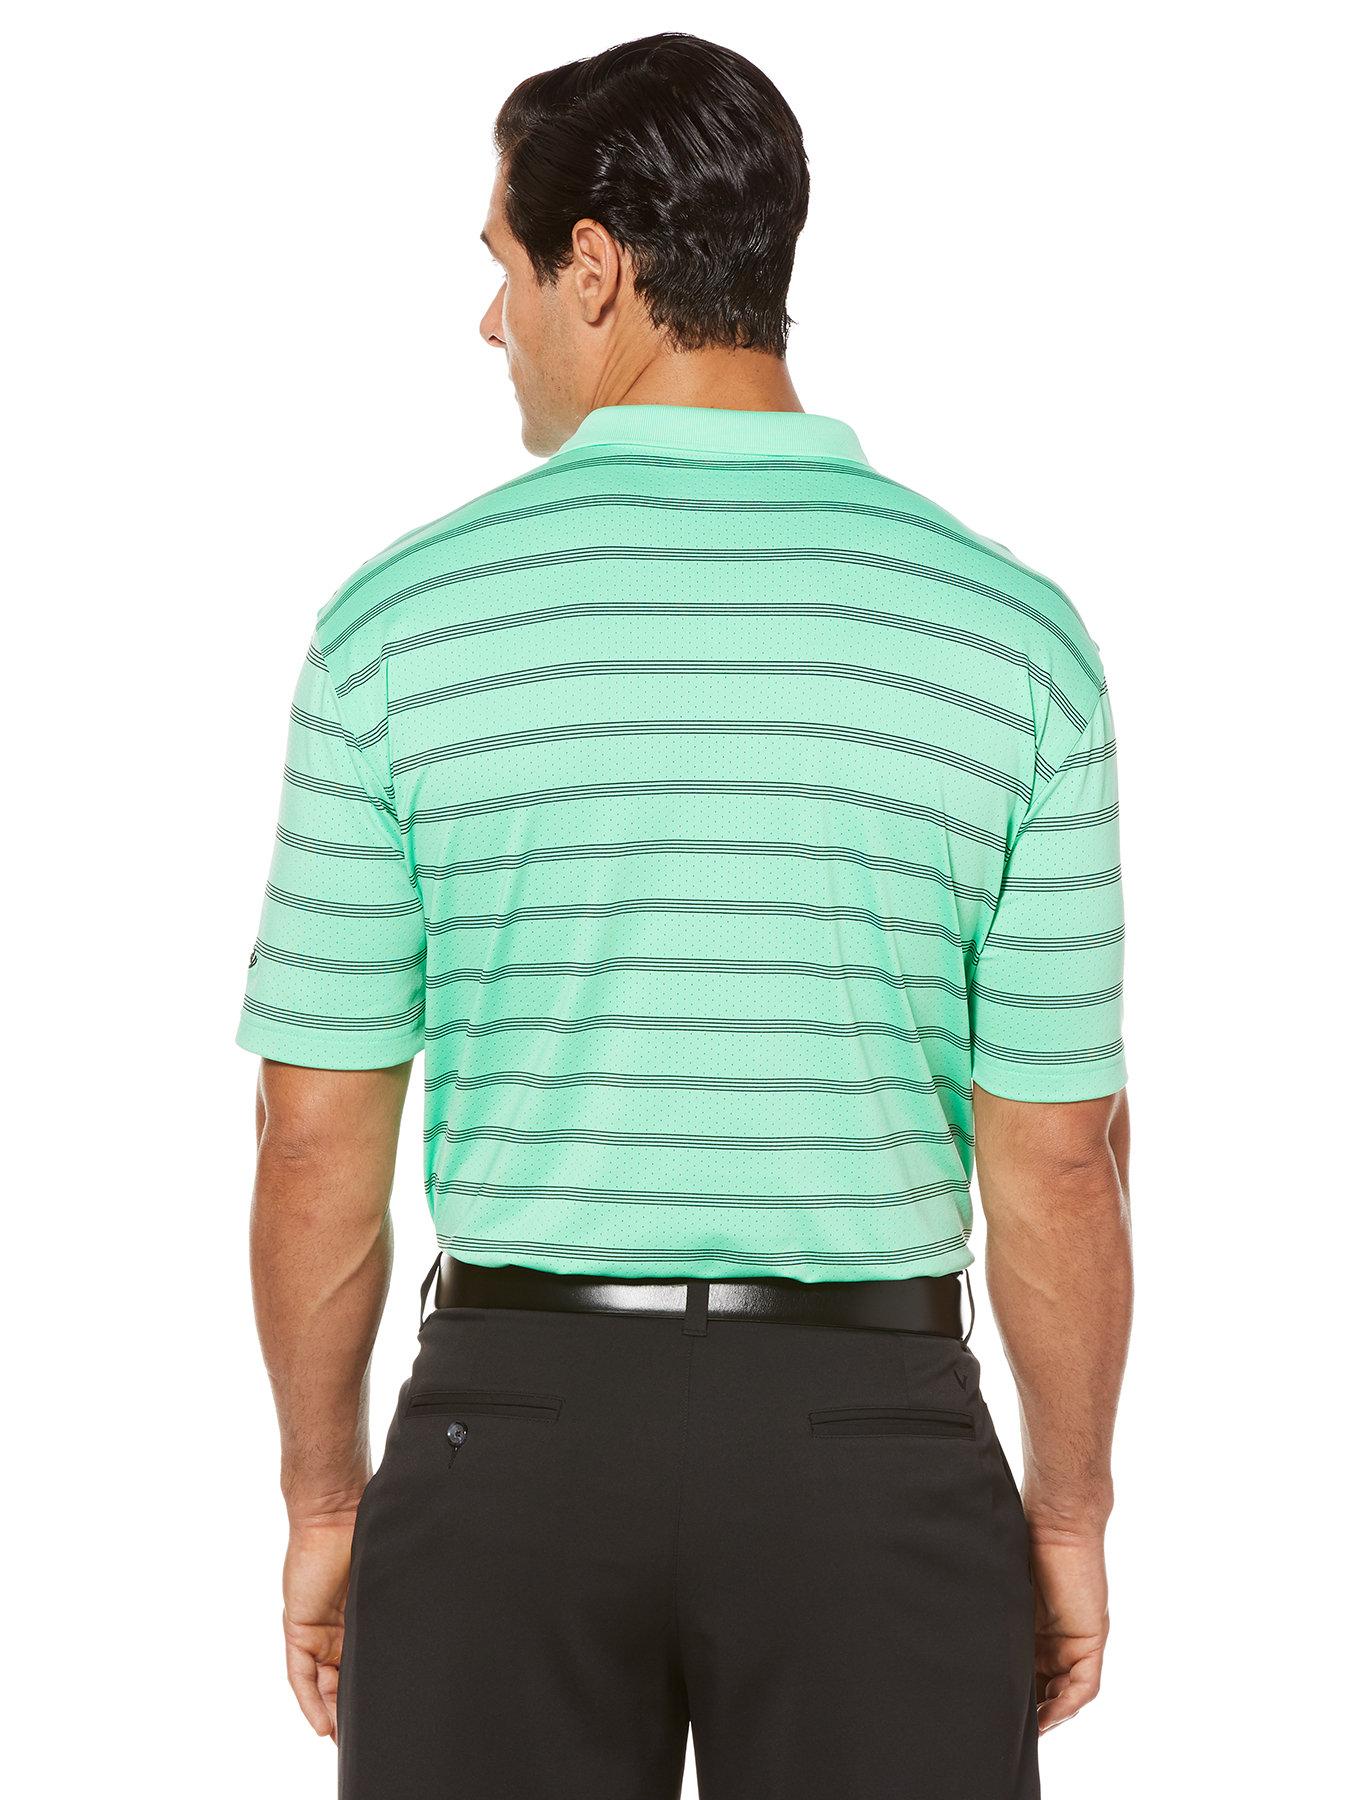 Callaway-Golf-Men-039-s-Performance-Stripe-Polo-Shirt-Pick-Color-amp-Size thumbnail 9